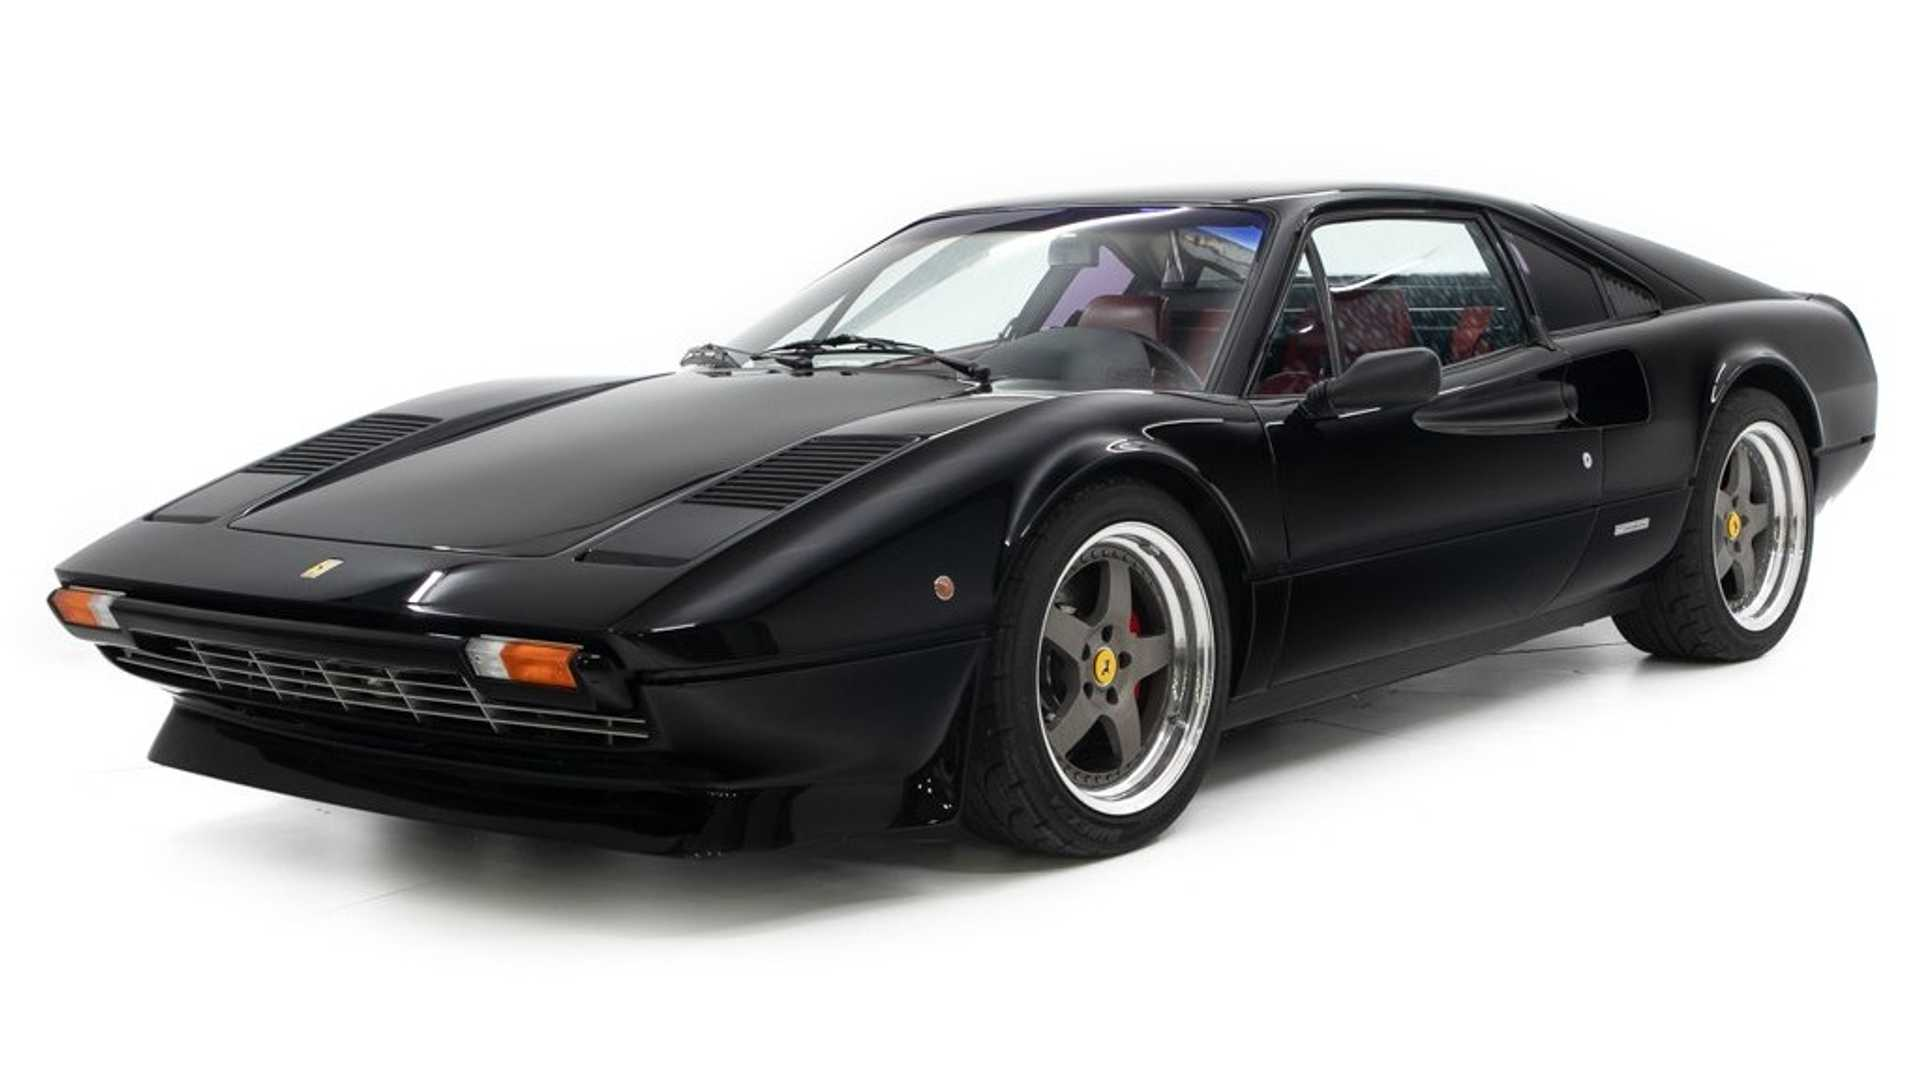 Supercharged Ferrari 308 Gtb Is A Black Beauty Motorious